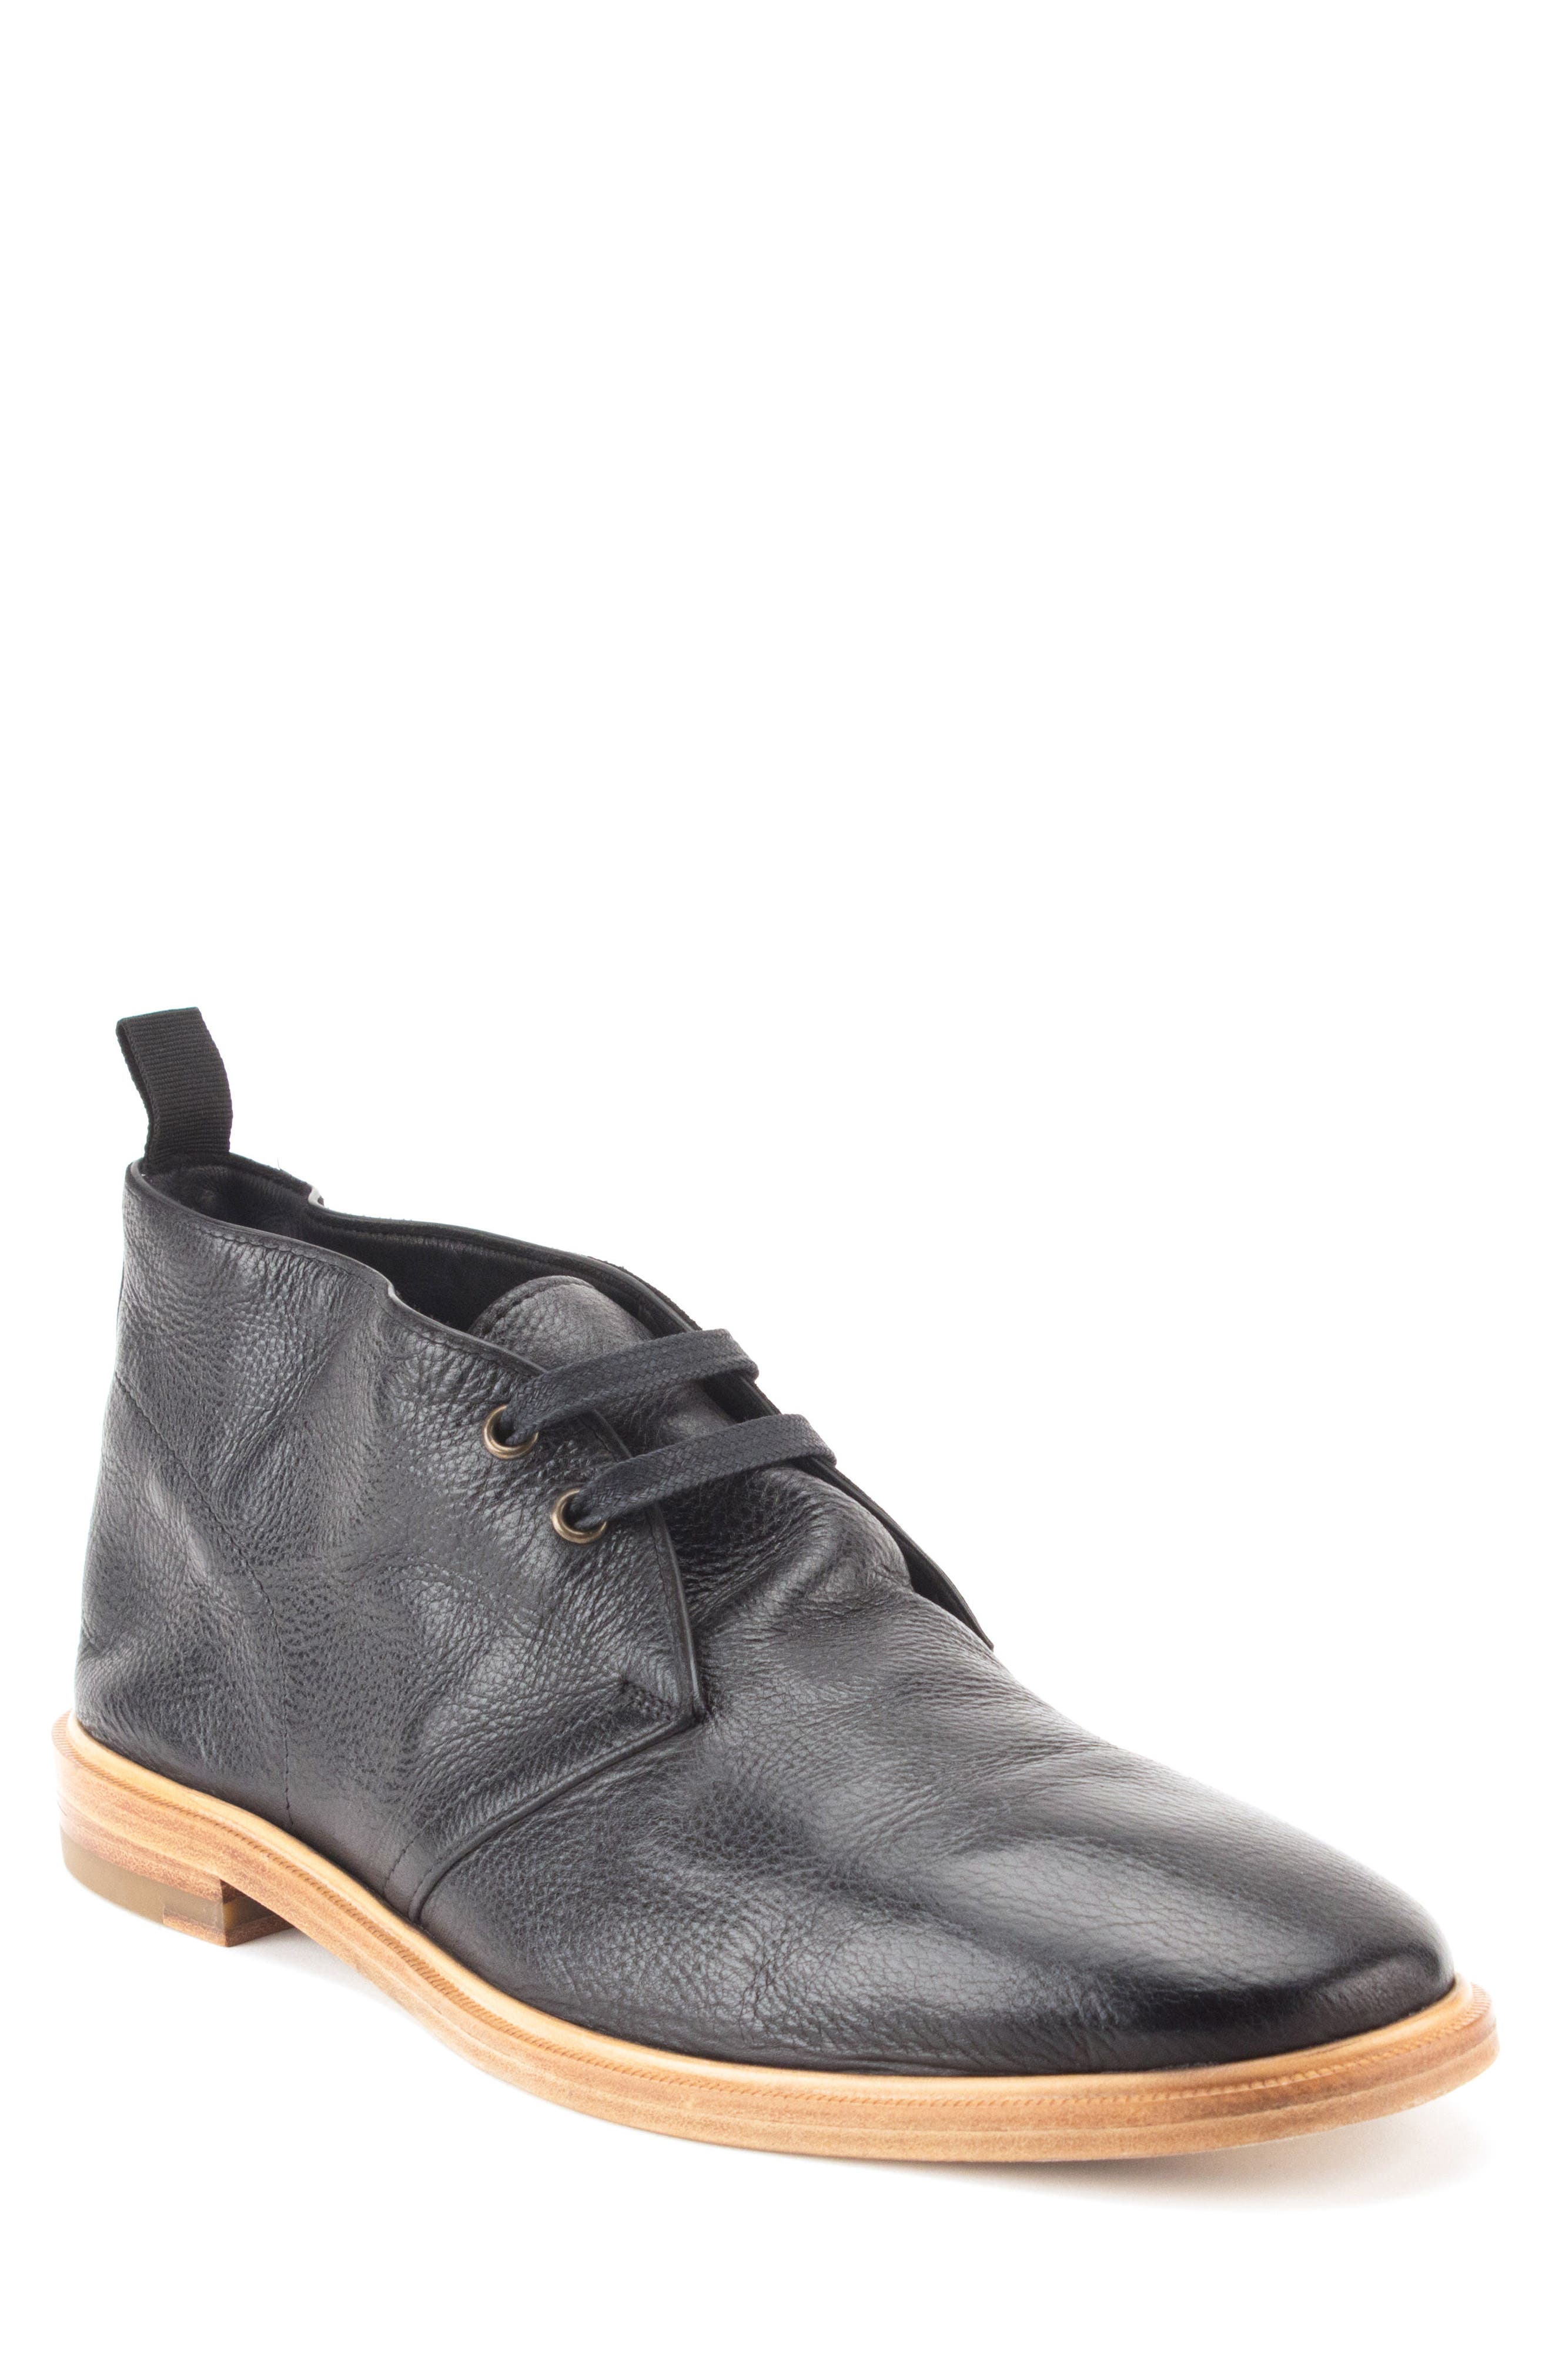 Luke Chukka Boot,                             Main thumbnail 1, color,                             Black Leather